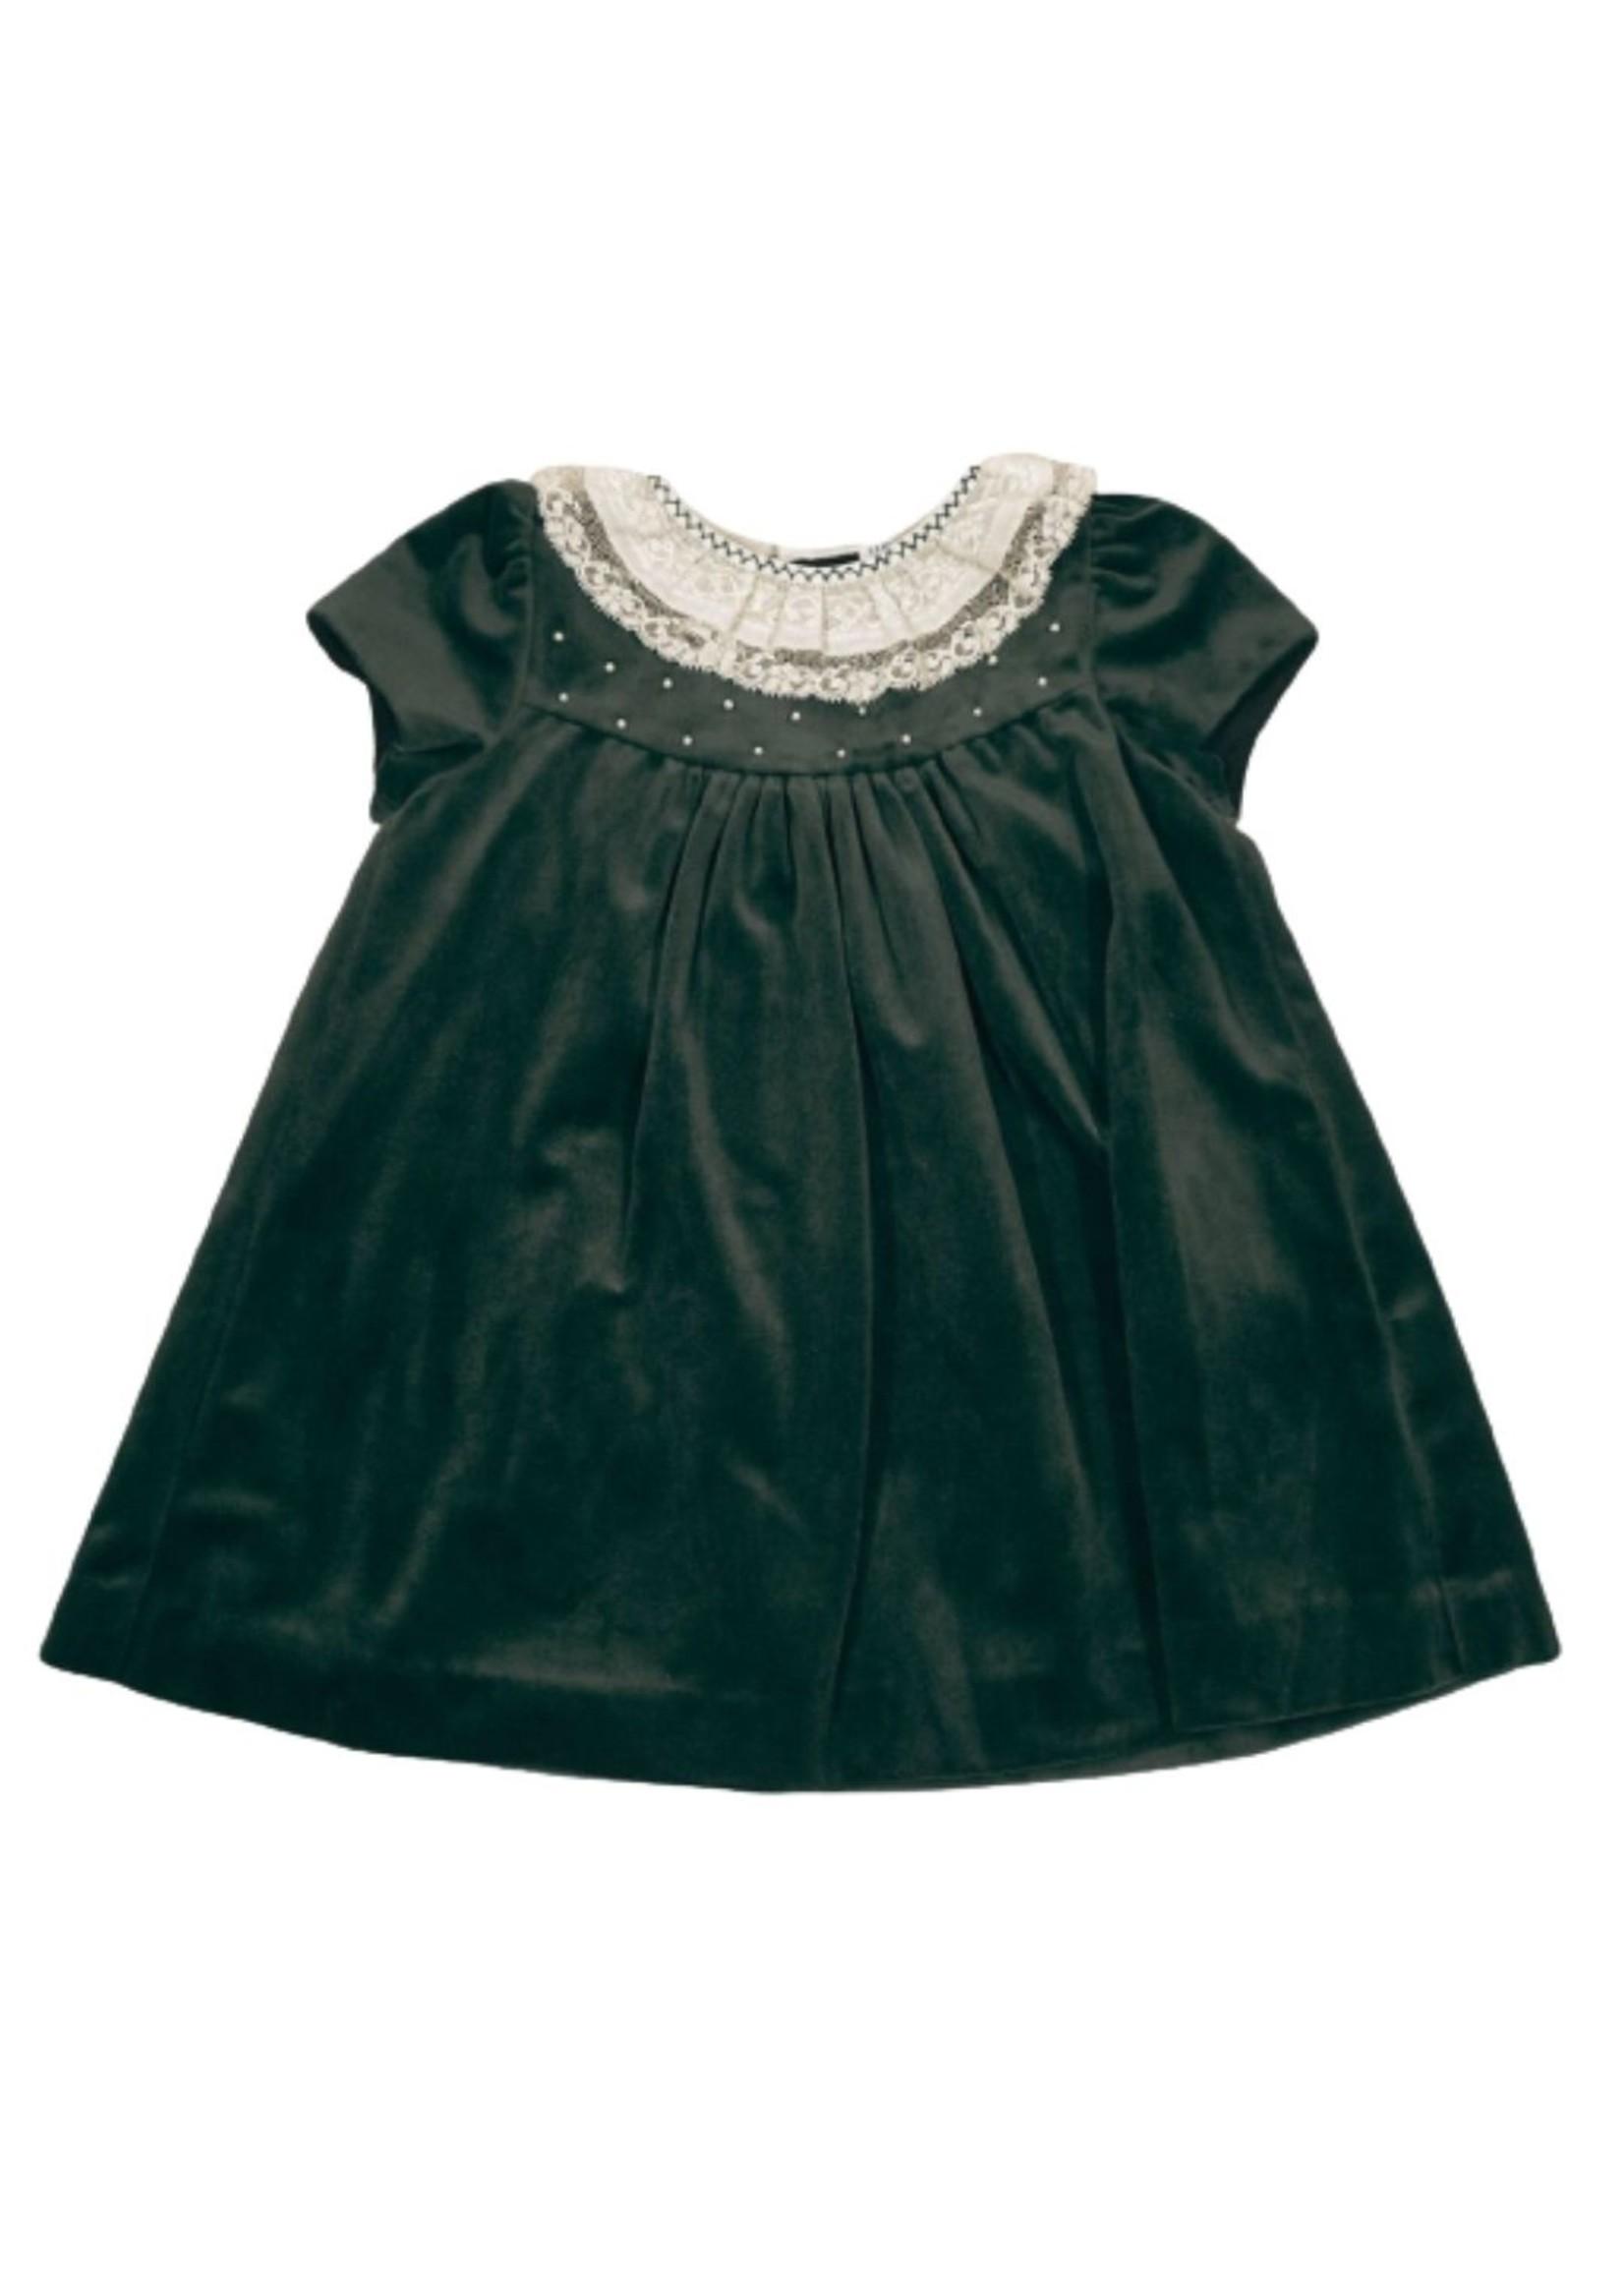 Luli & Me Luli & Me Black Velvet Dress